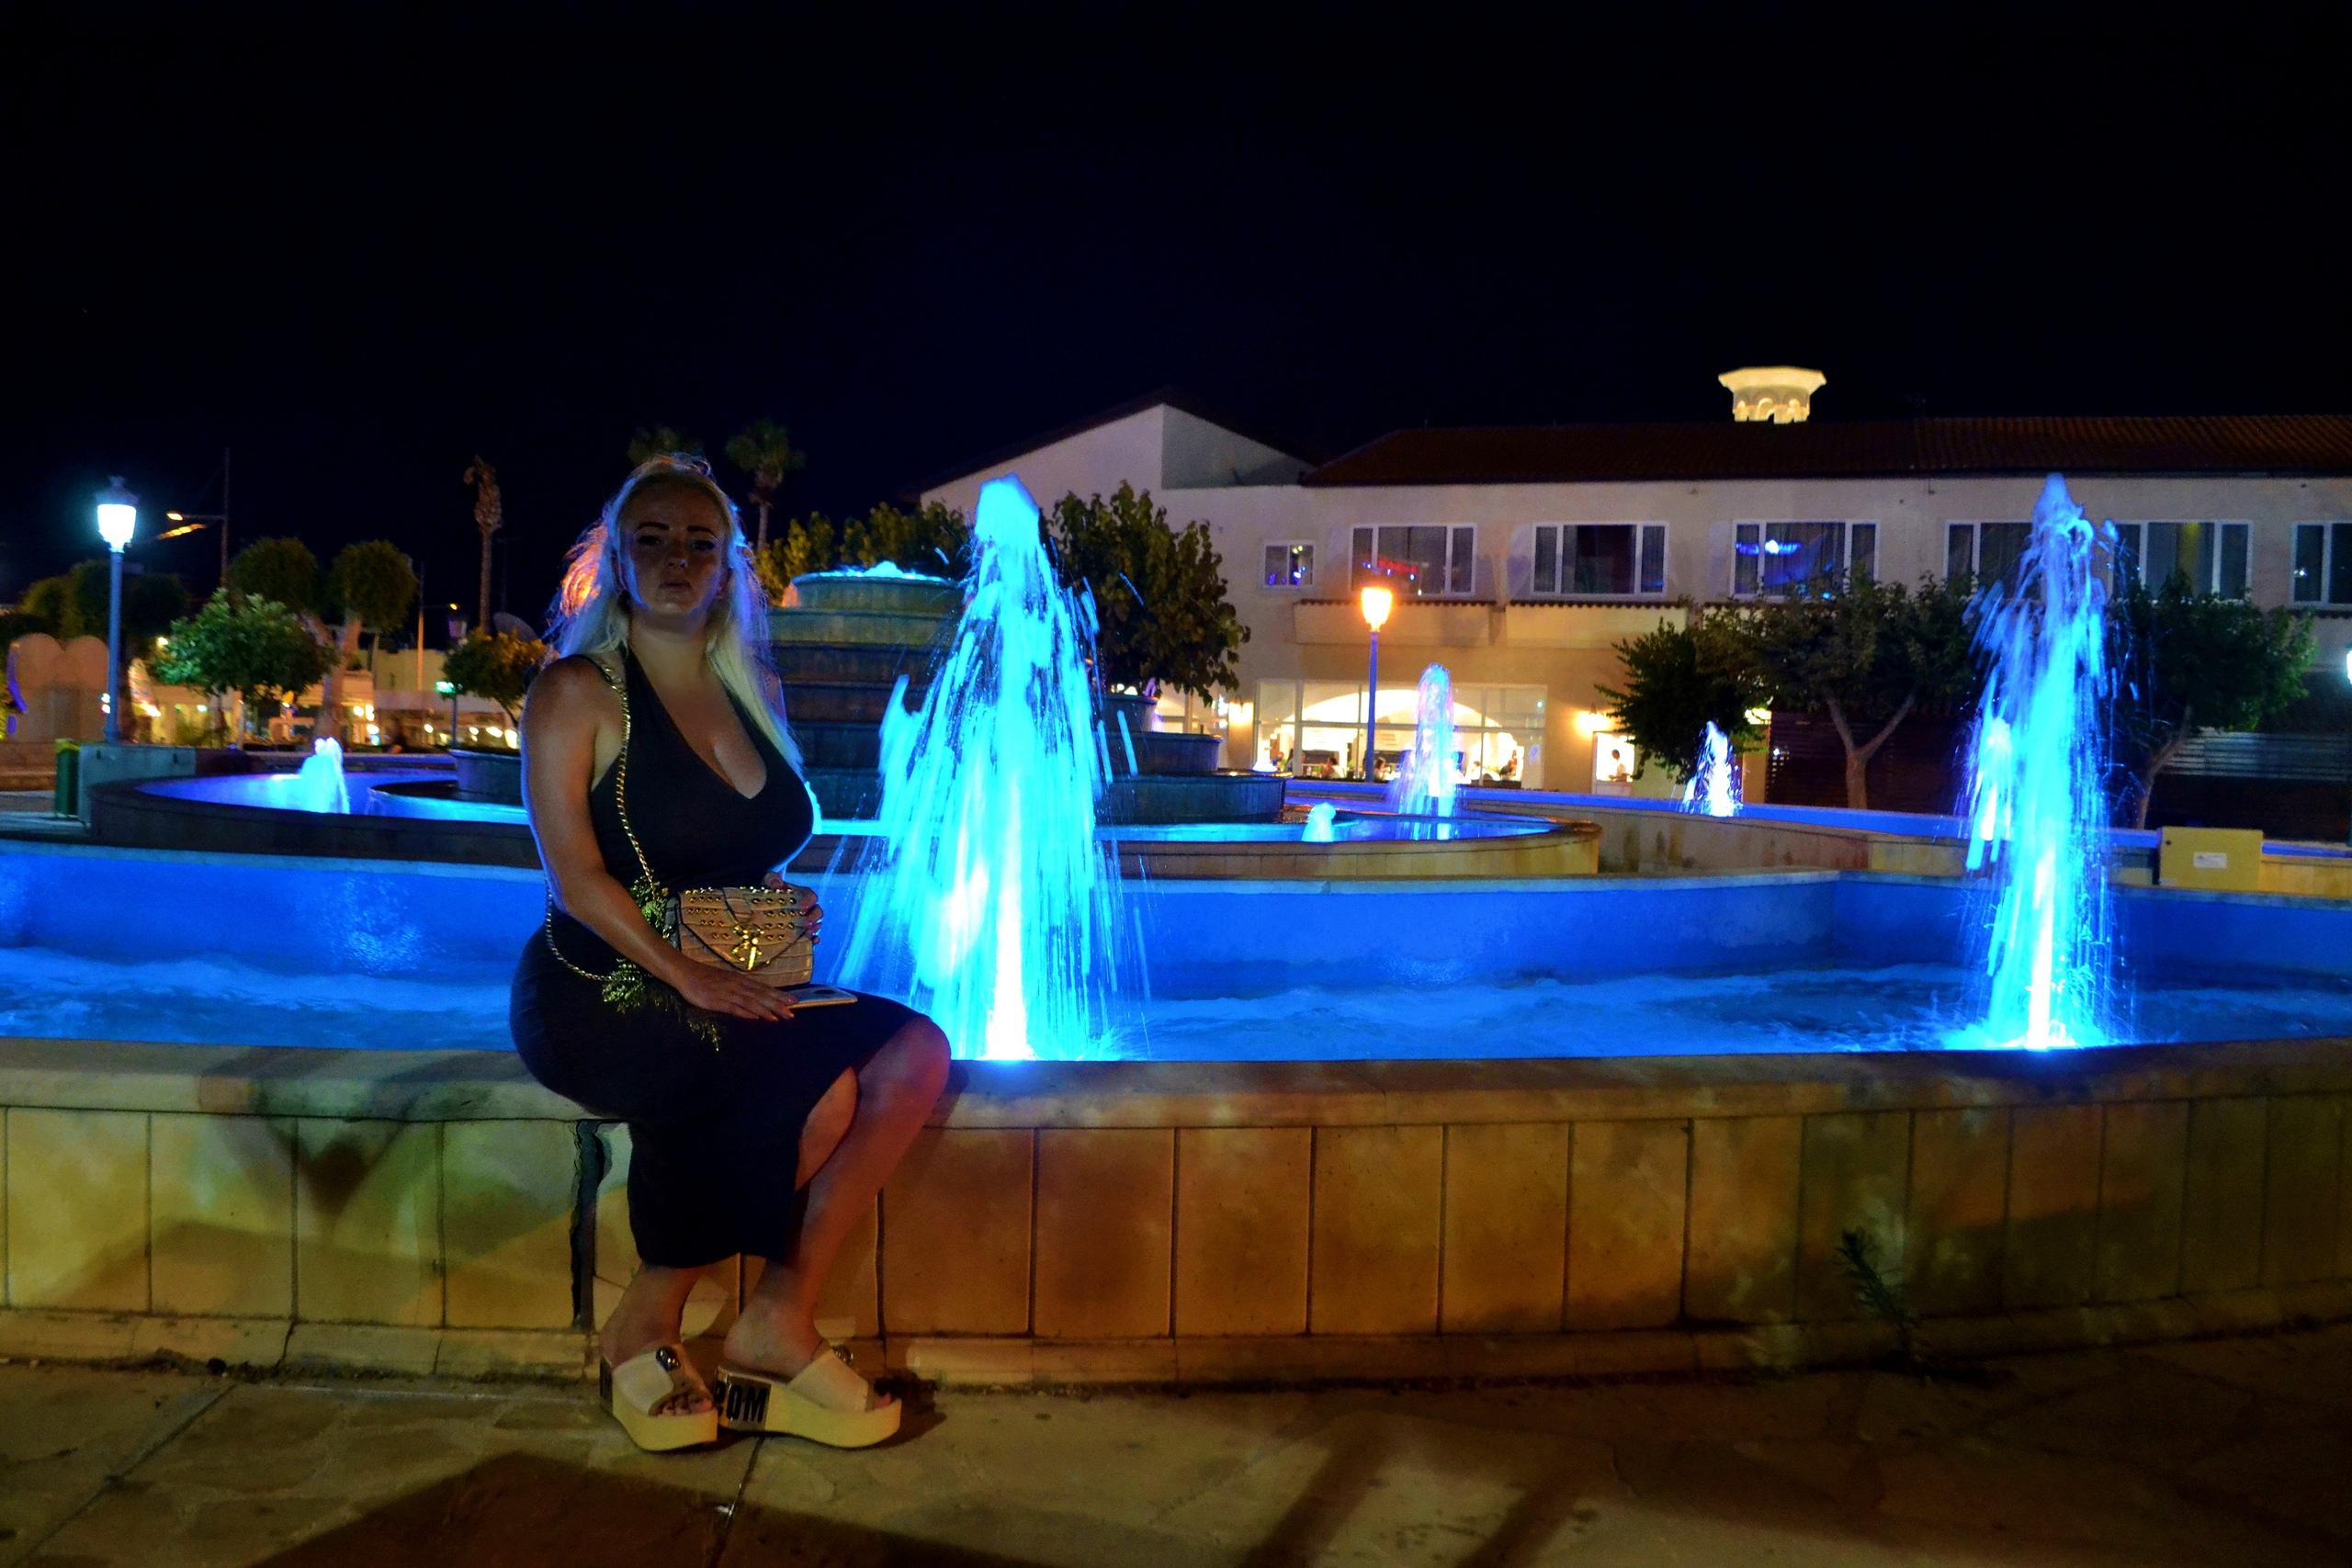 Елена Руденко (Валтея). Кипр. Айия-Напа (фото). - Страница 9 Rr6mnDKF2DY